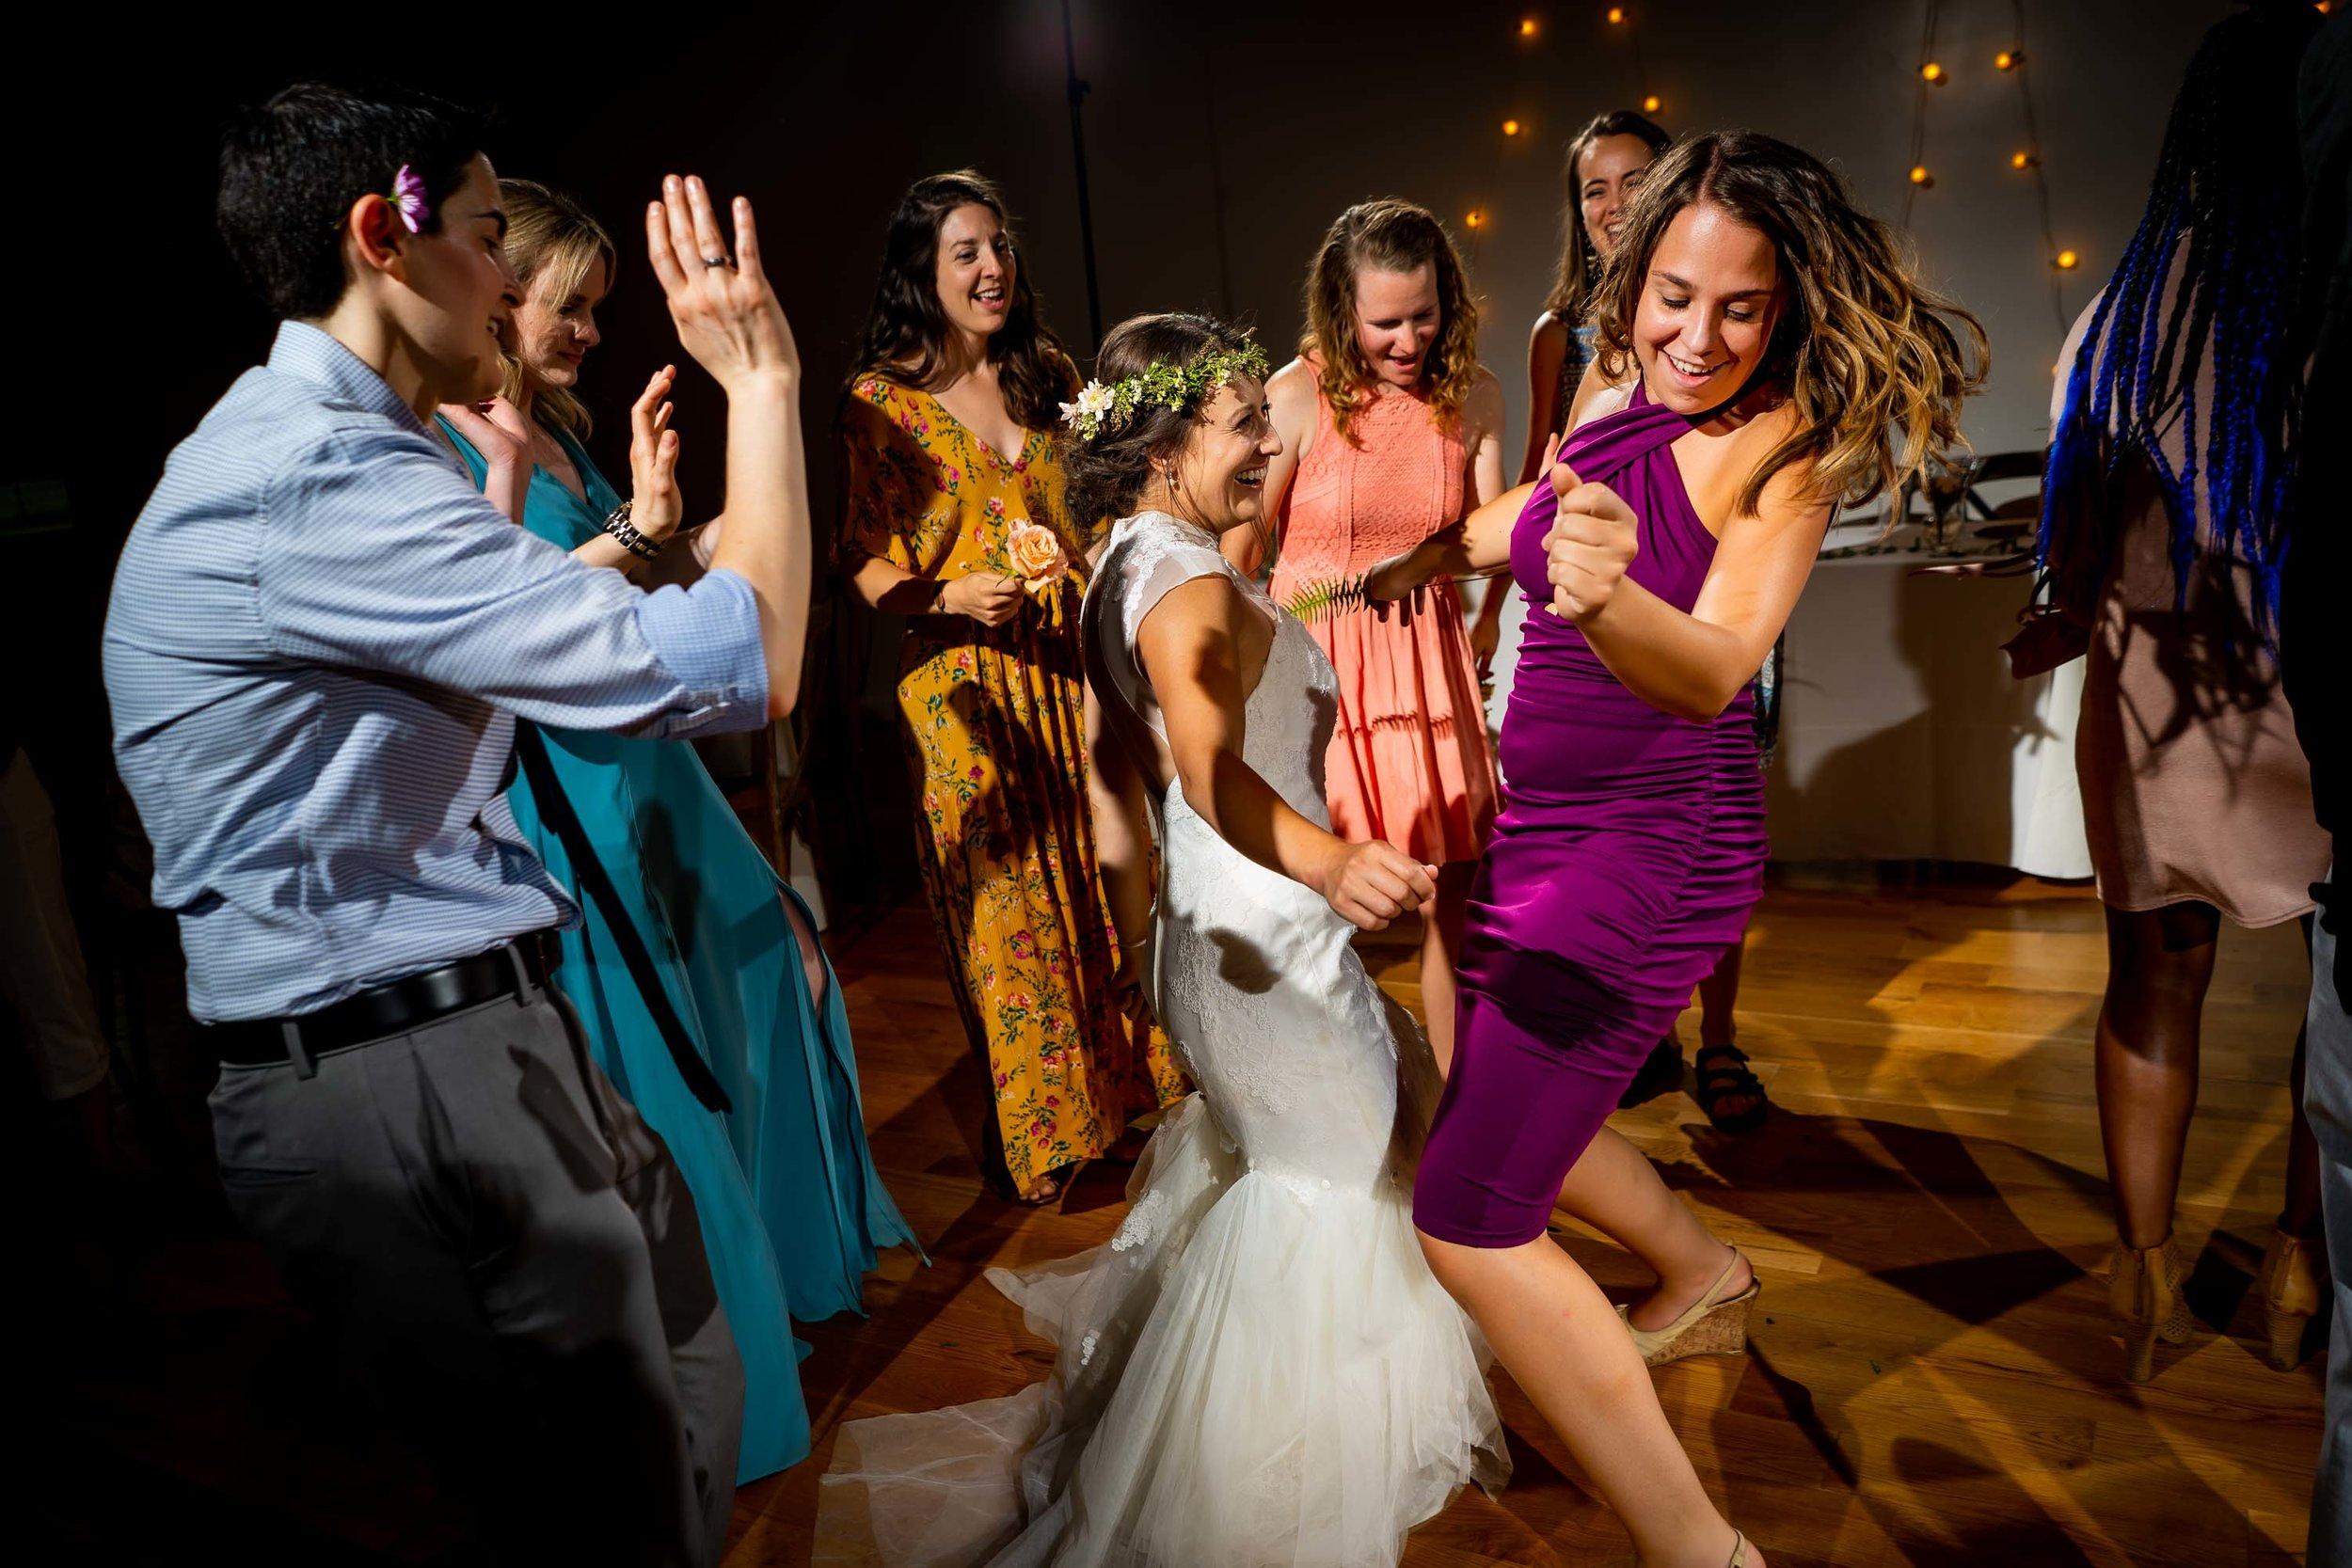 Rist_Canyon_Inn_Laporte_Wedding-186.jpg